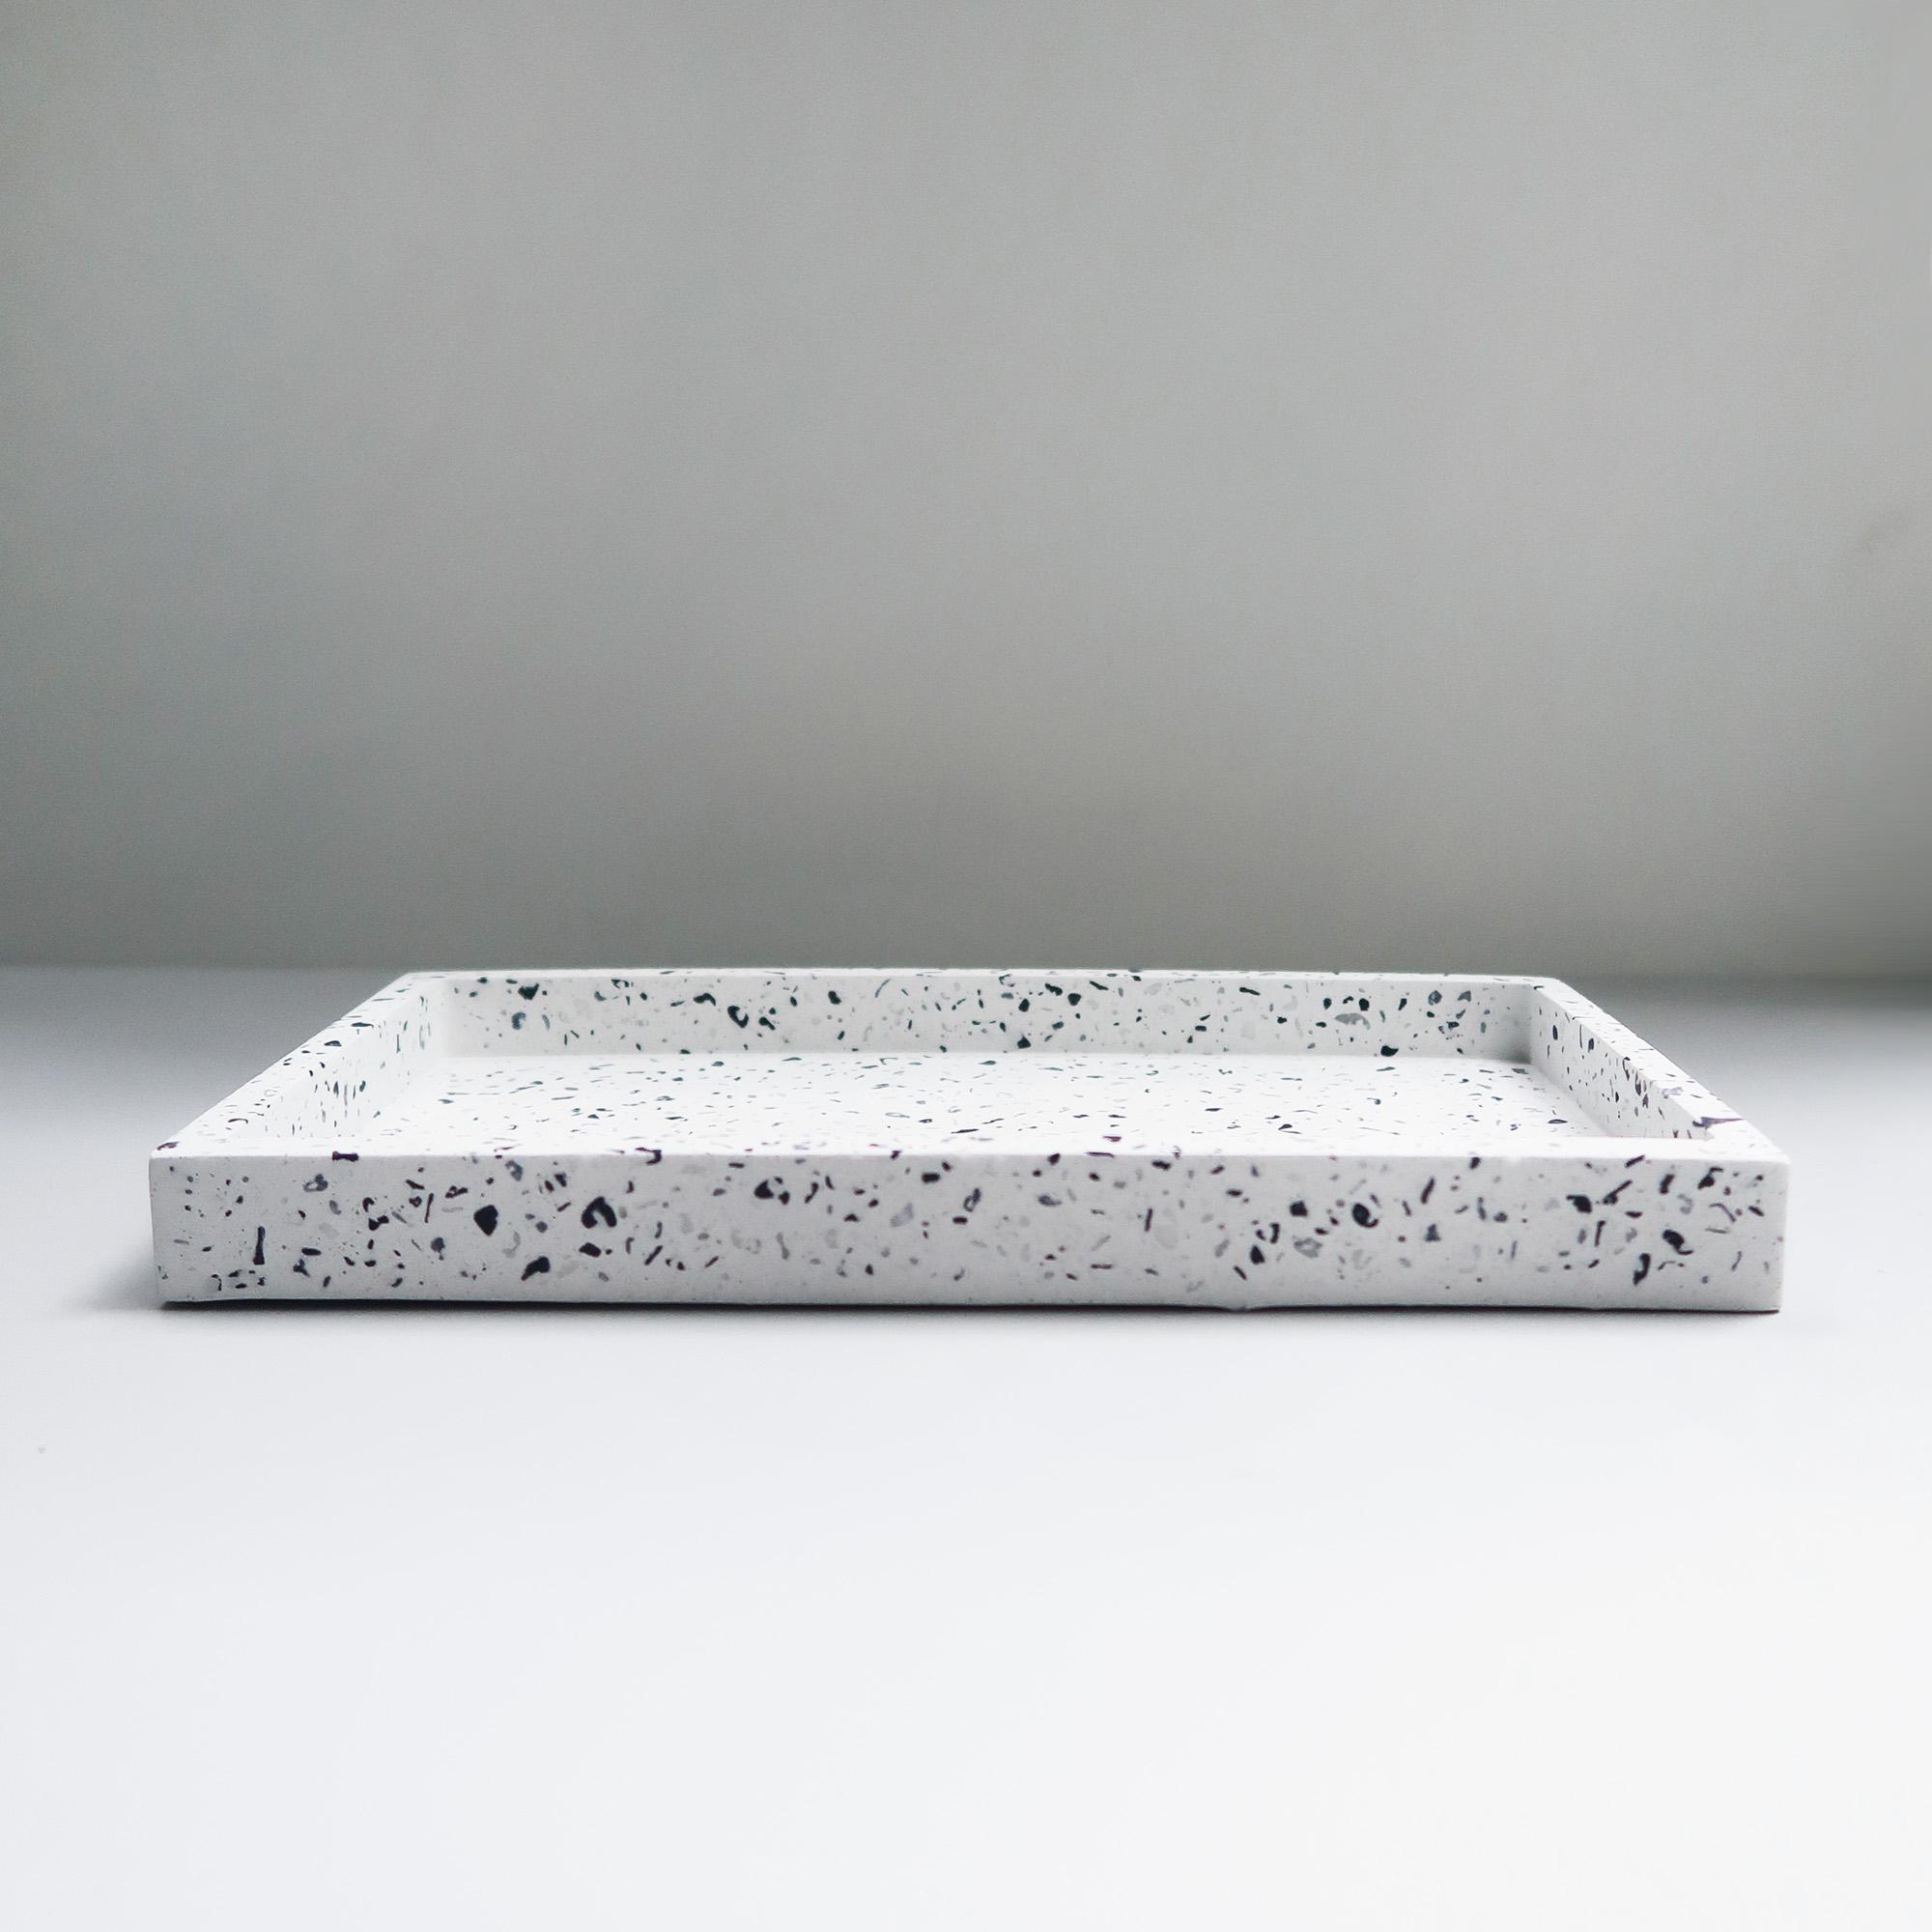 TERRAZZO 磨石子經典黑白水泥長方盤・拖盤・禮物